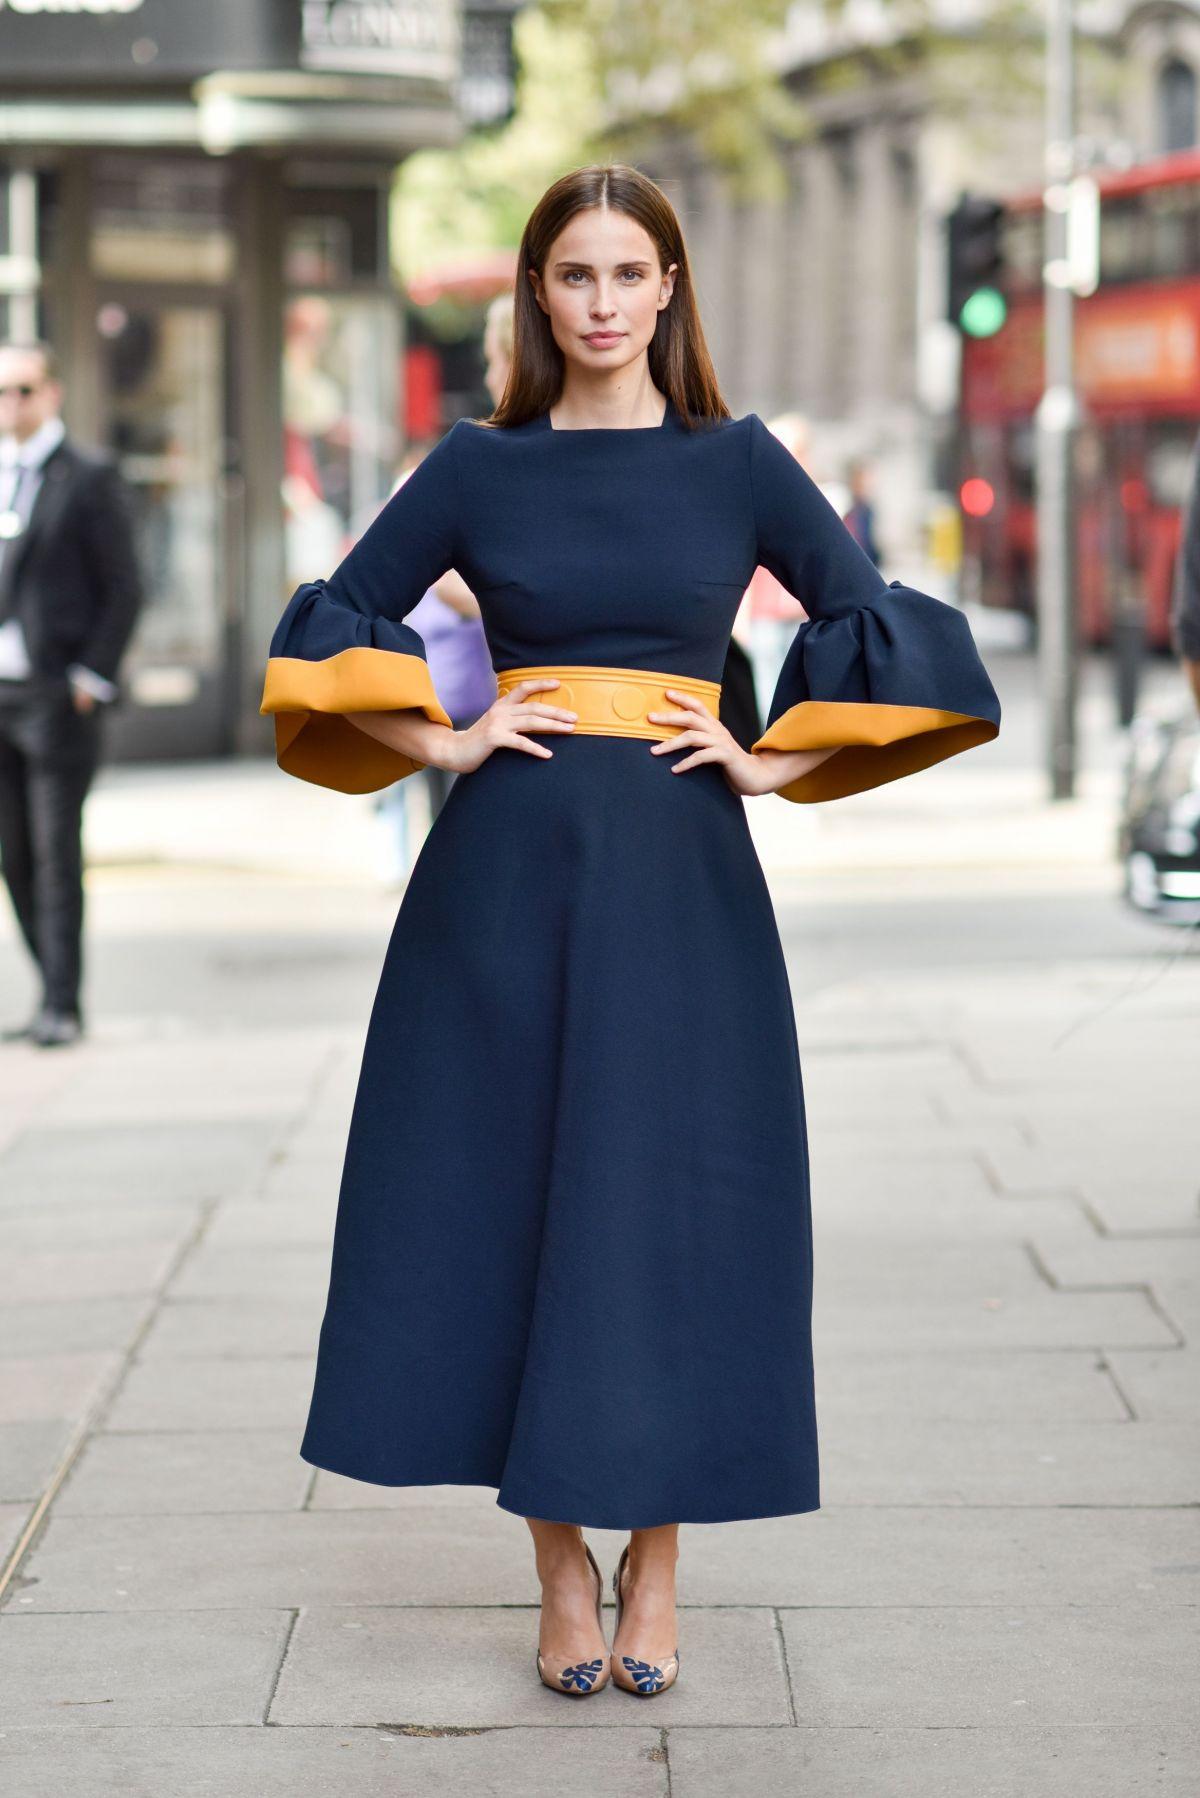 HEIDA REED Arrives at Roksanda fashion Show at London Fashion Week 09/19/2016